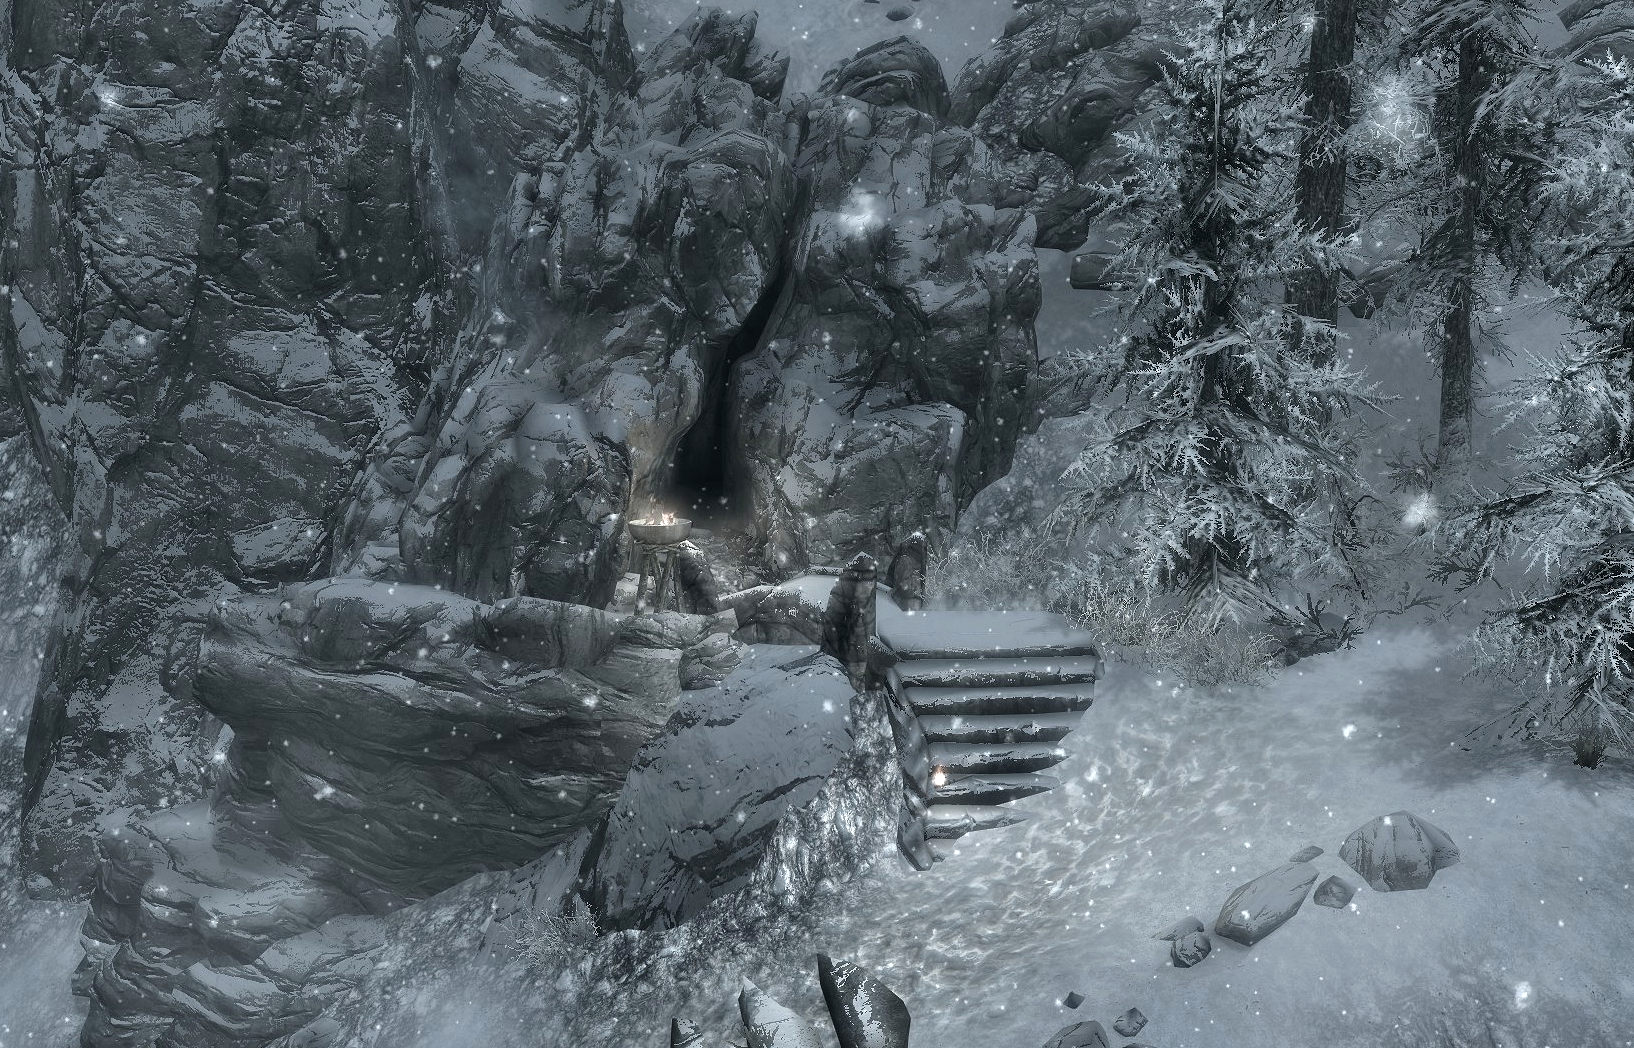 Daedric Armor Morrowind Dimhollow Crypt ...